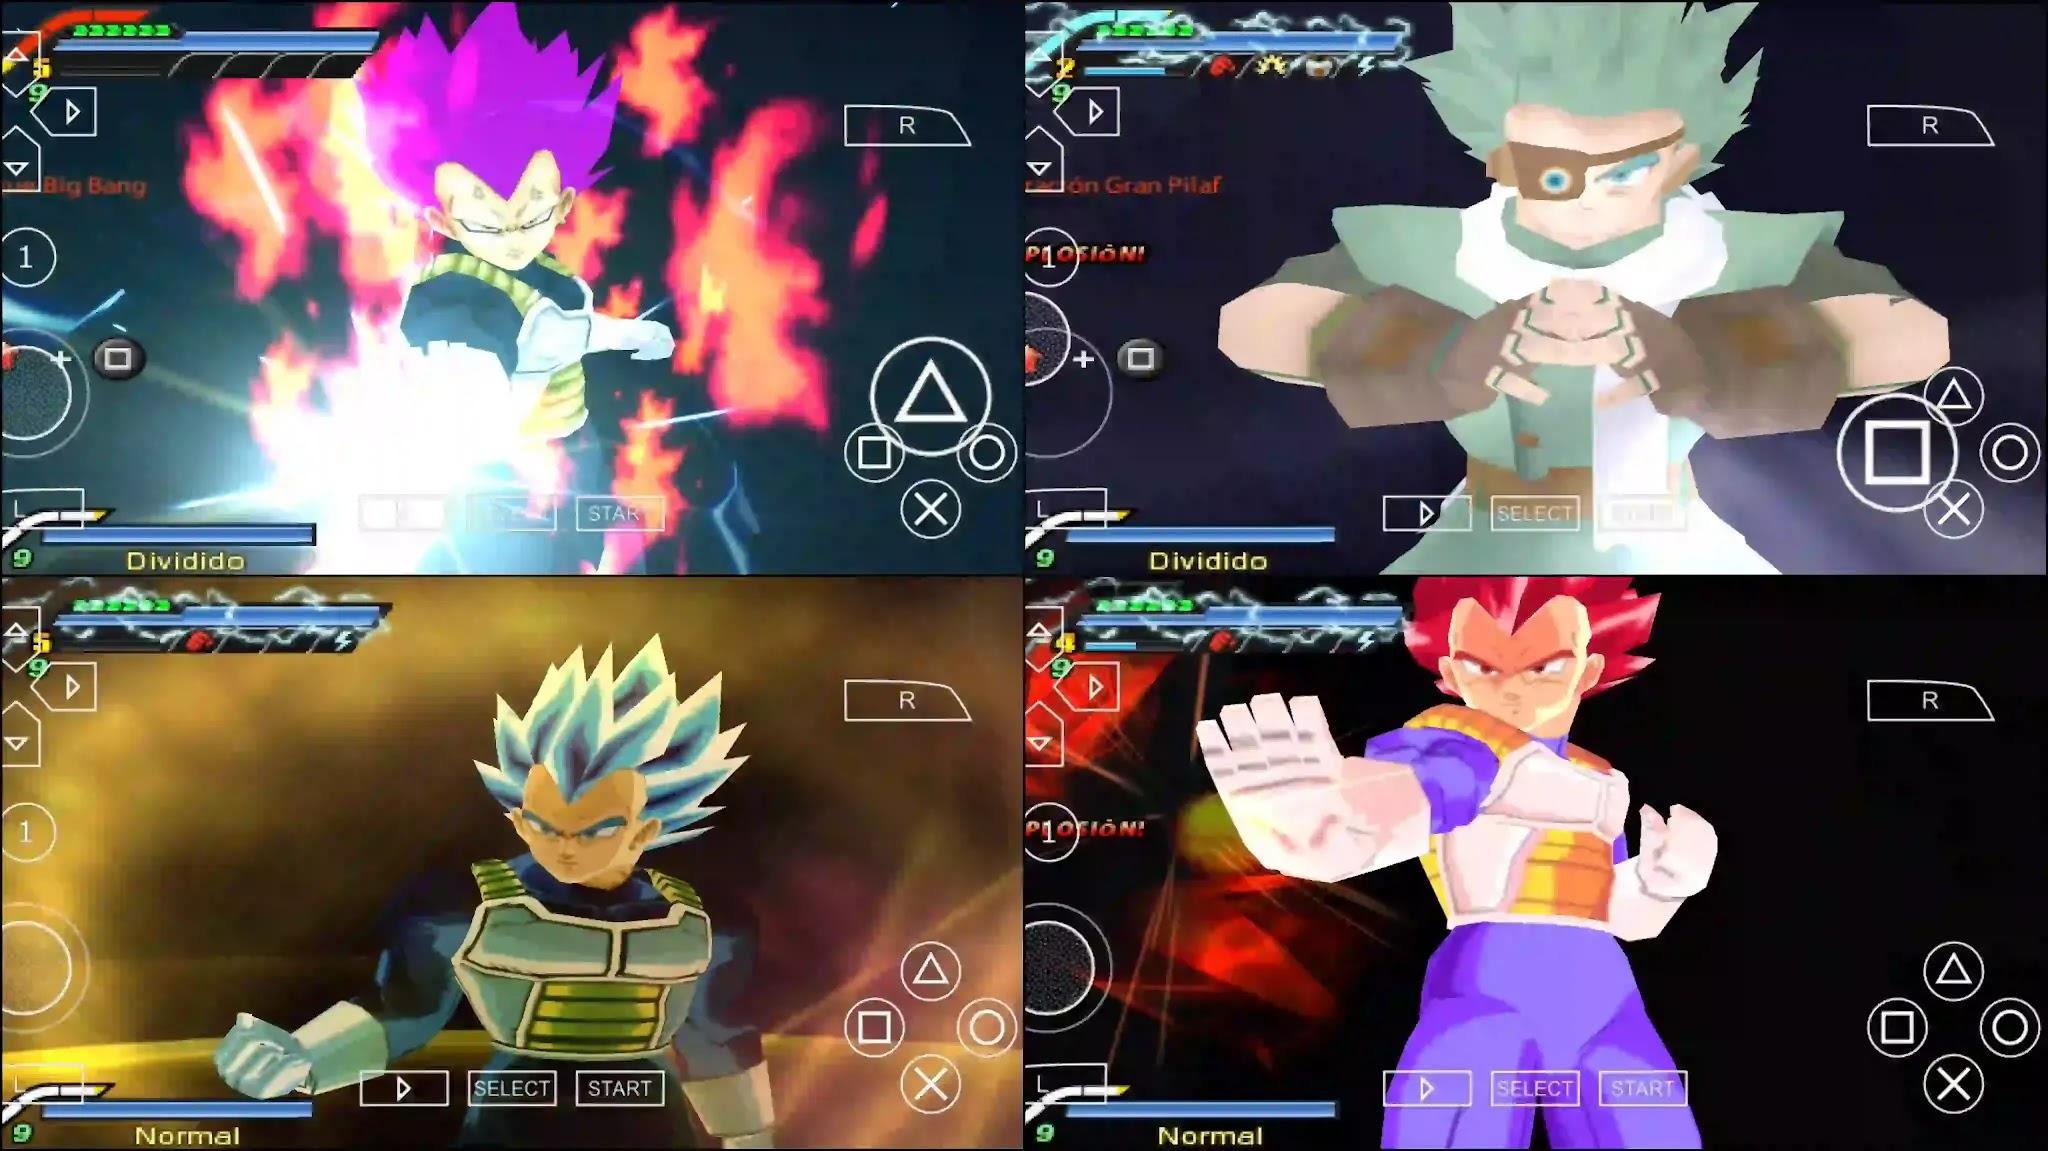 Dragon Ball Super Vegeta Ultra Ego PPSSPP